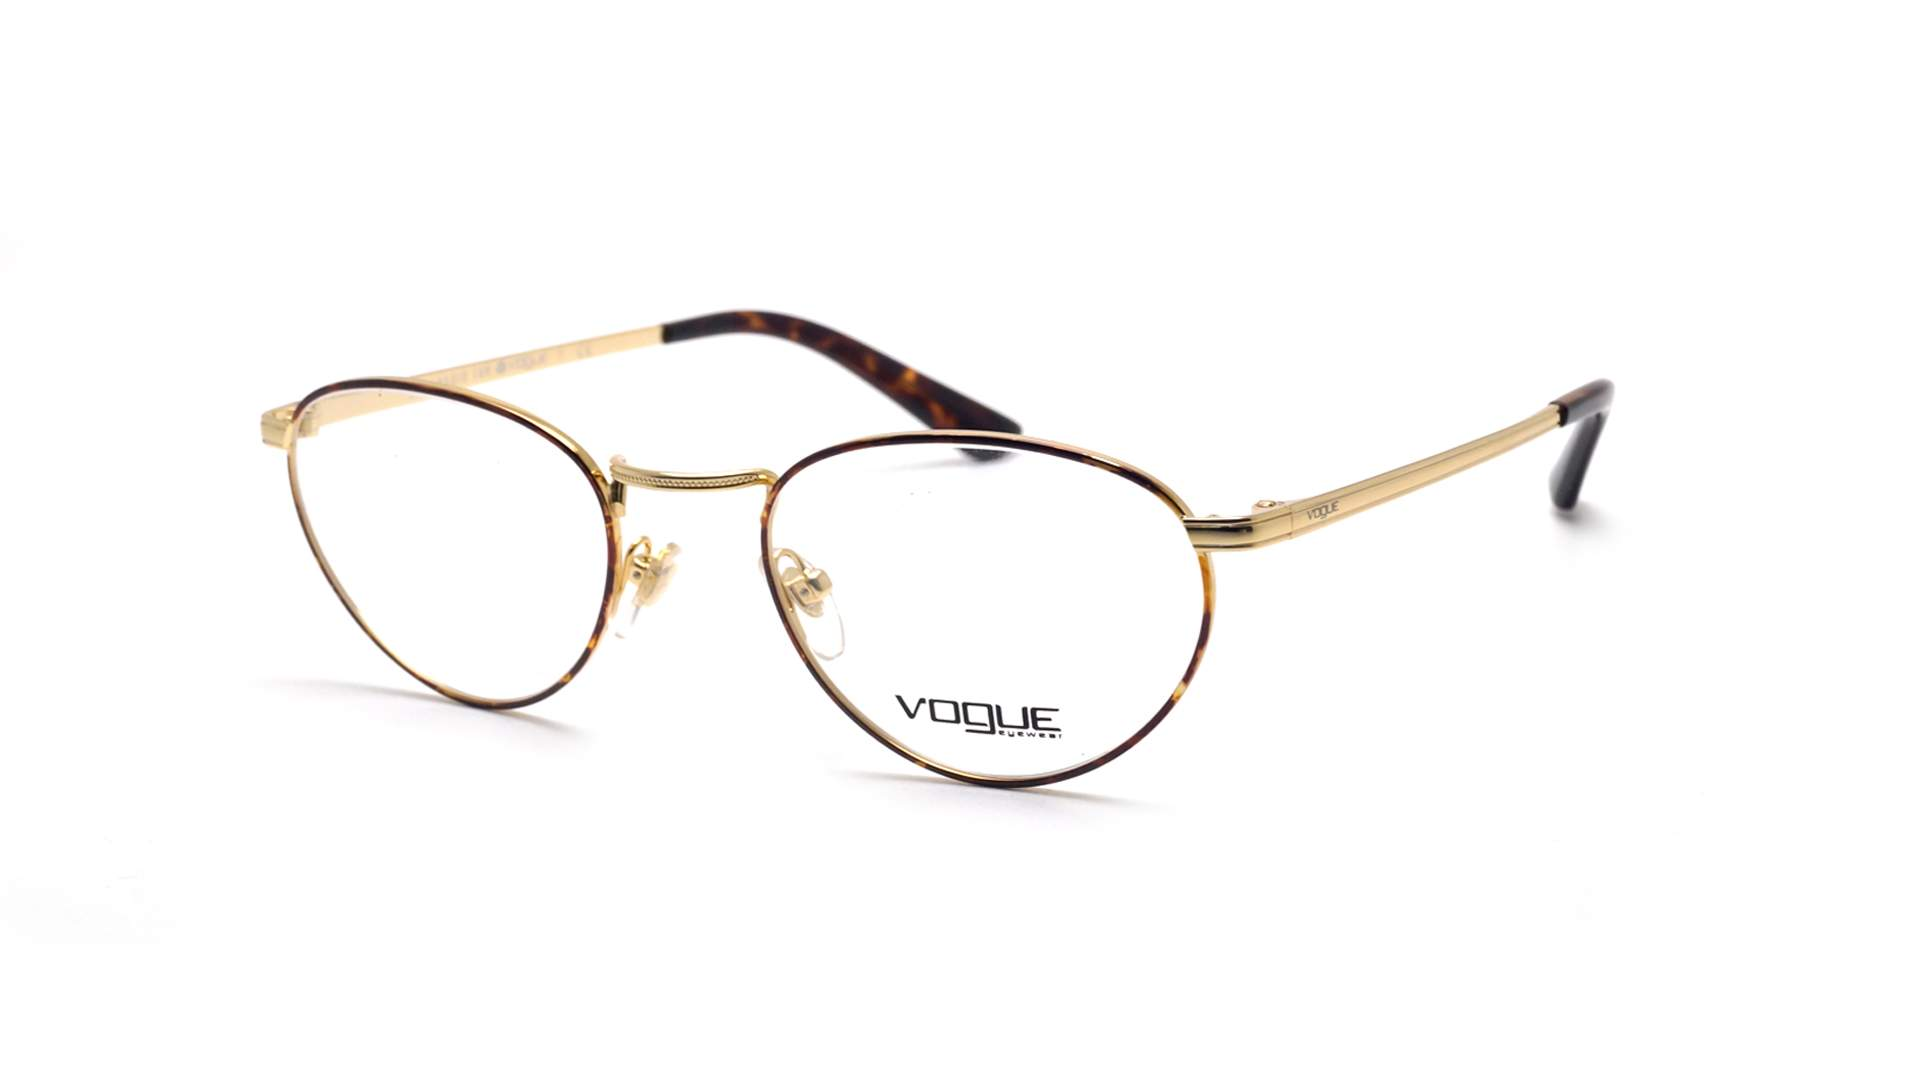 Hadid 50 Écaille Small Vogue Gigi 5078 Vo4084 20 hQrdxtCsB